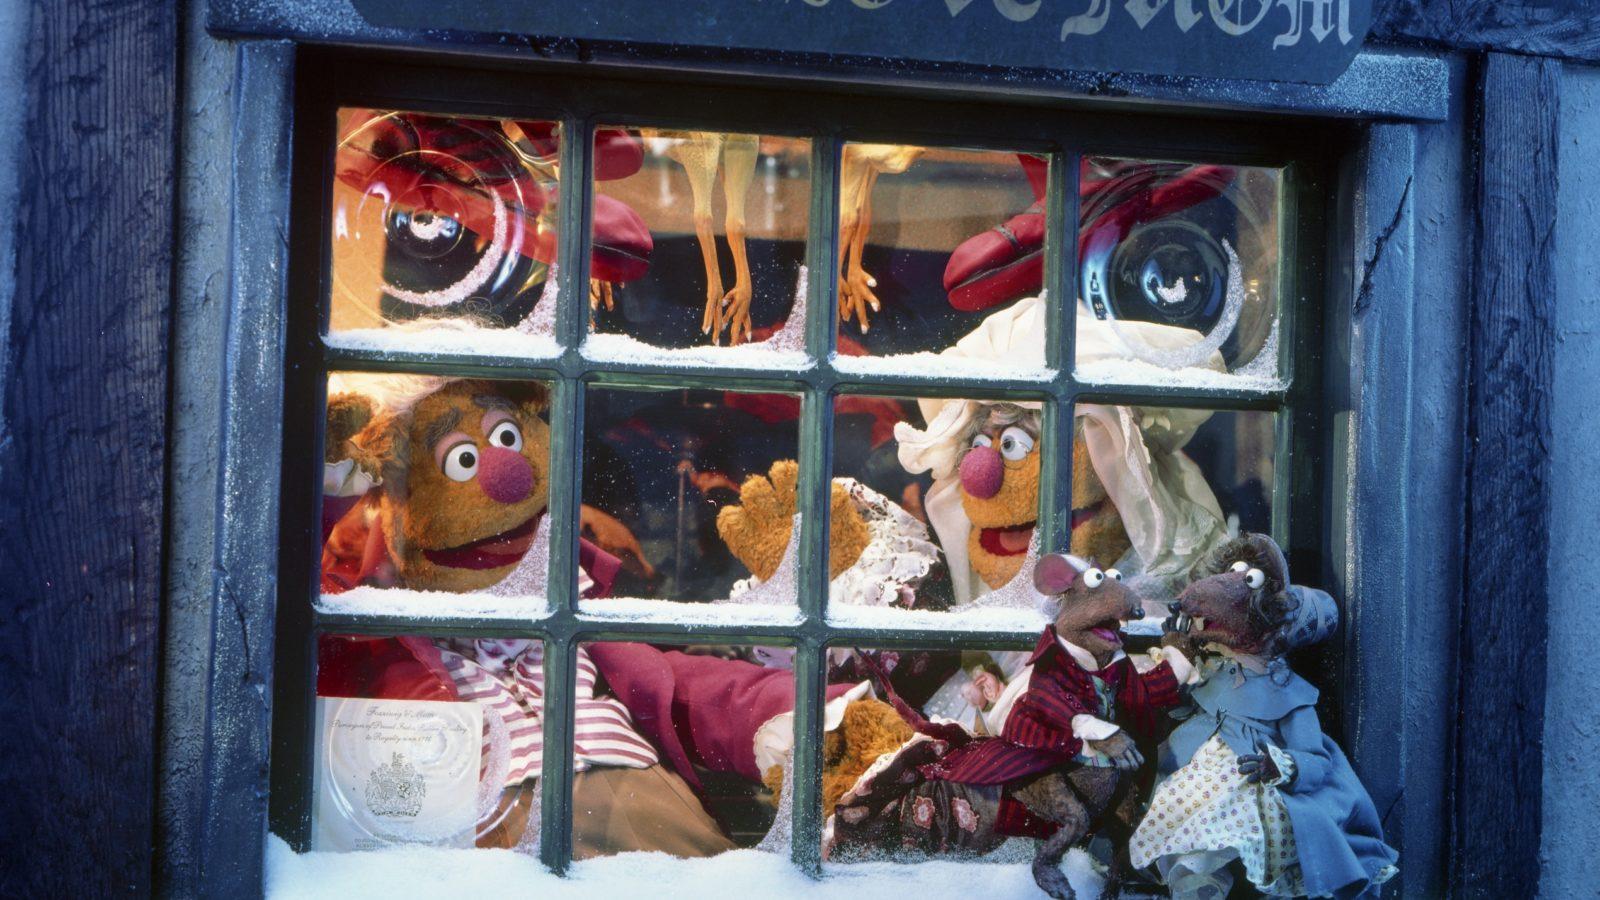 The Muppet Christmas Carol Trailer 1992.Bristol Film Festival The Muppet Christmas Carol What S